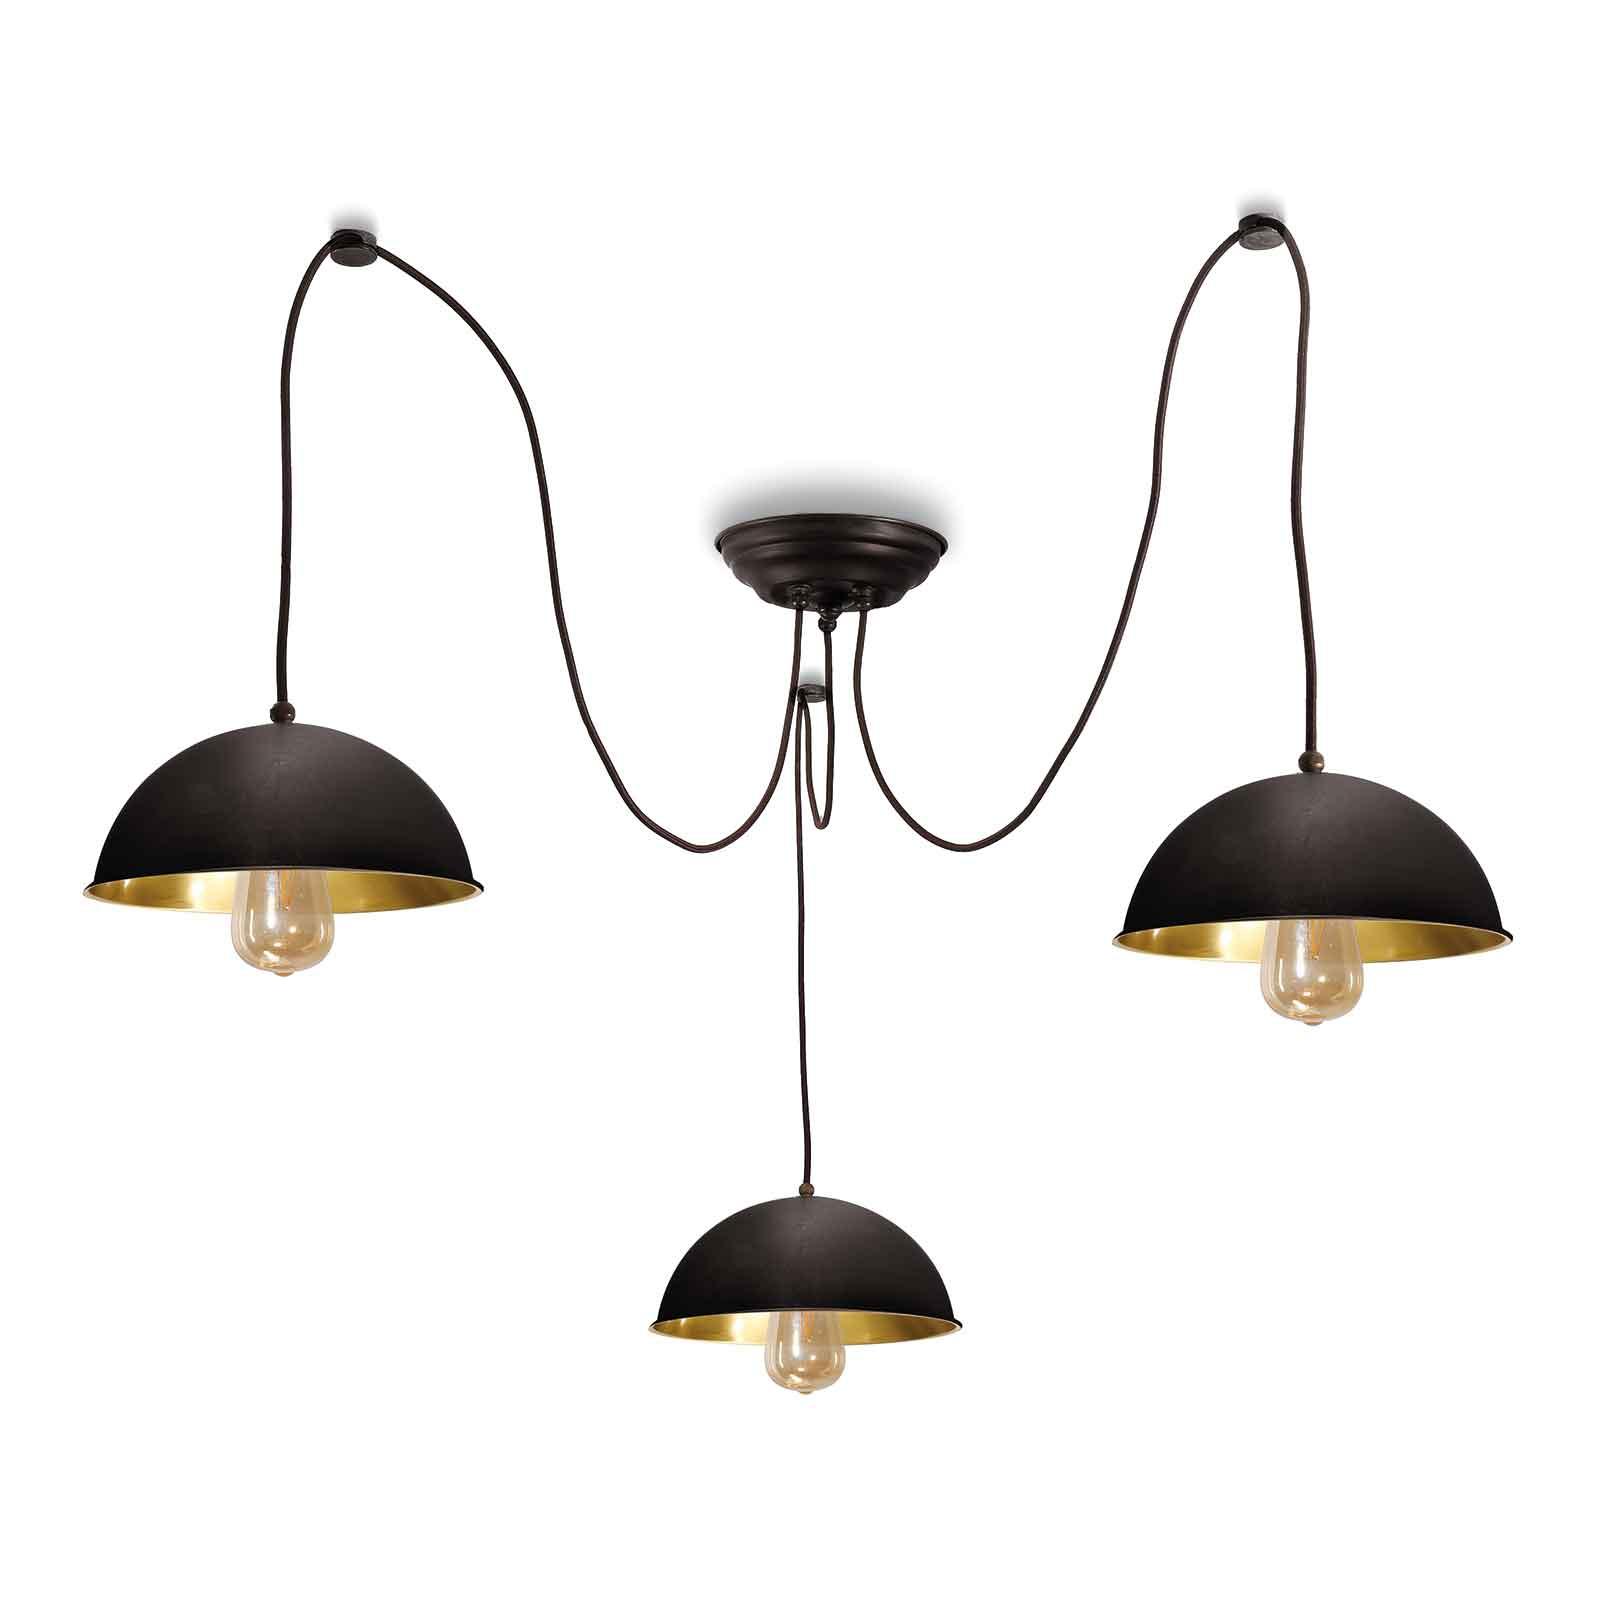 Suspension Circle 3248.3L, 3 lampes laiton bruni